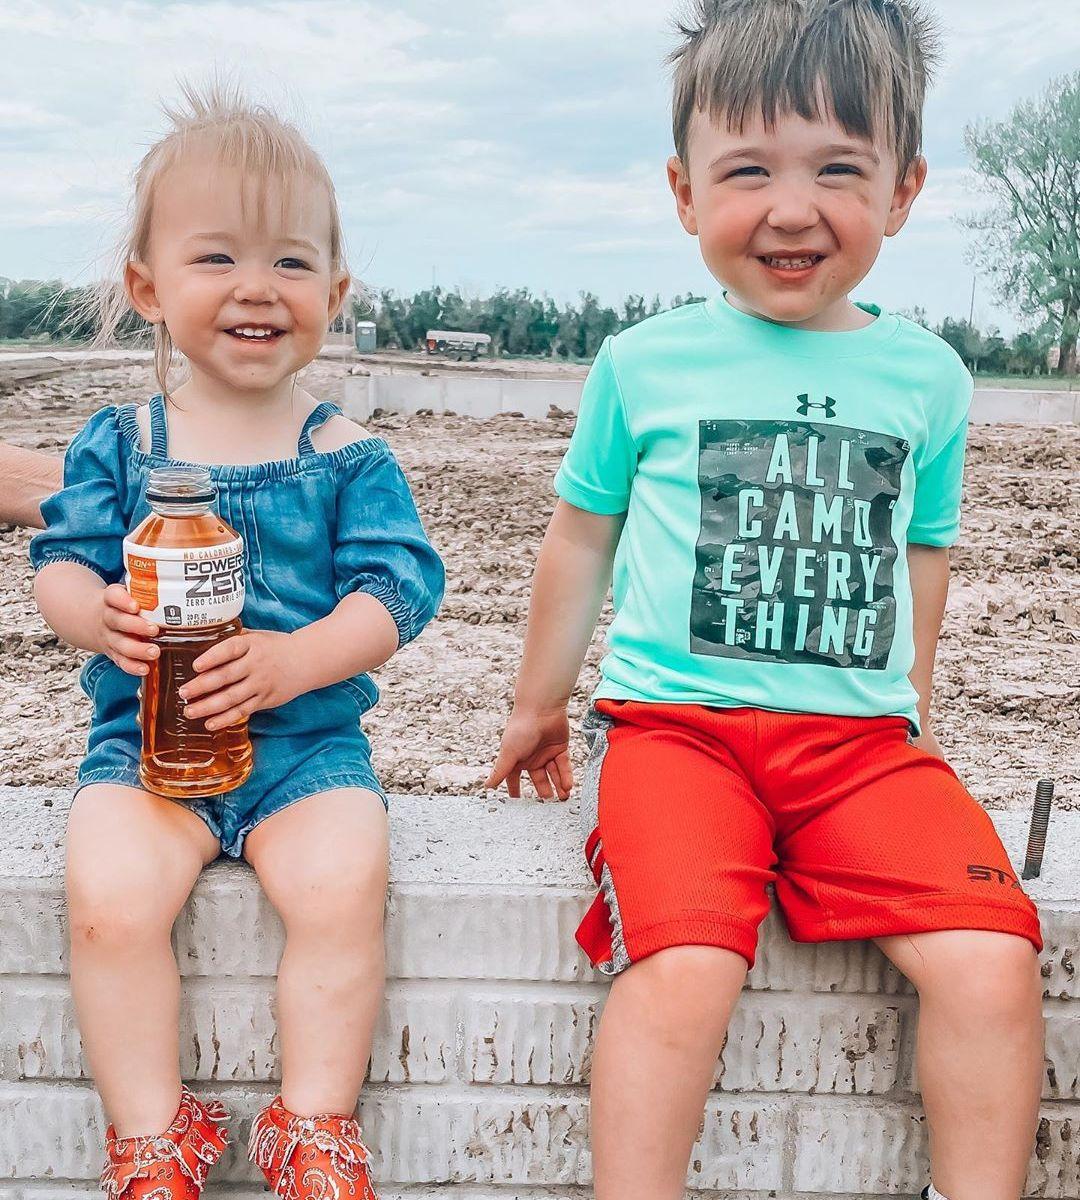 Chelsea Houska Gives Tour Of Farm Home With Cole Deboer Photos